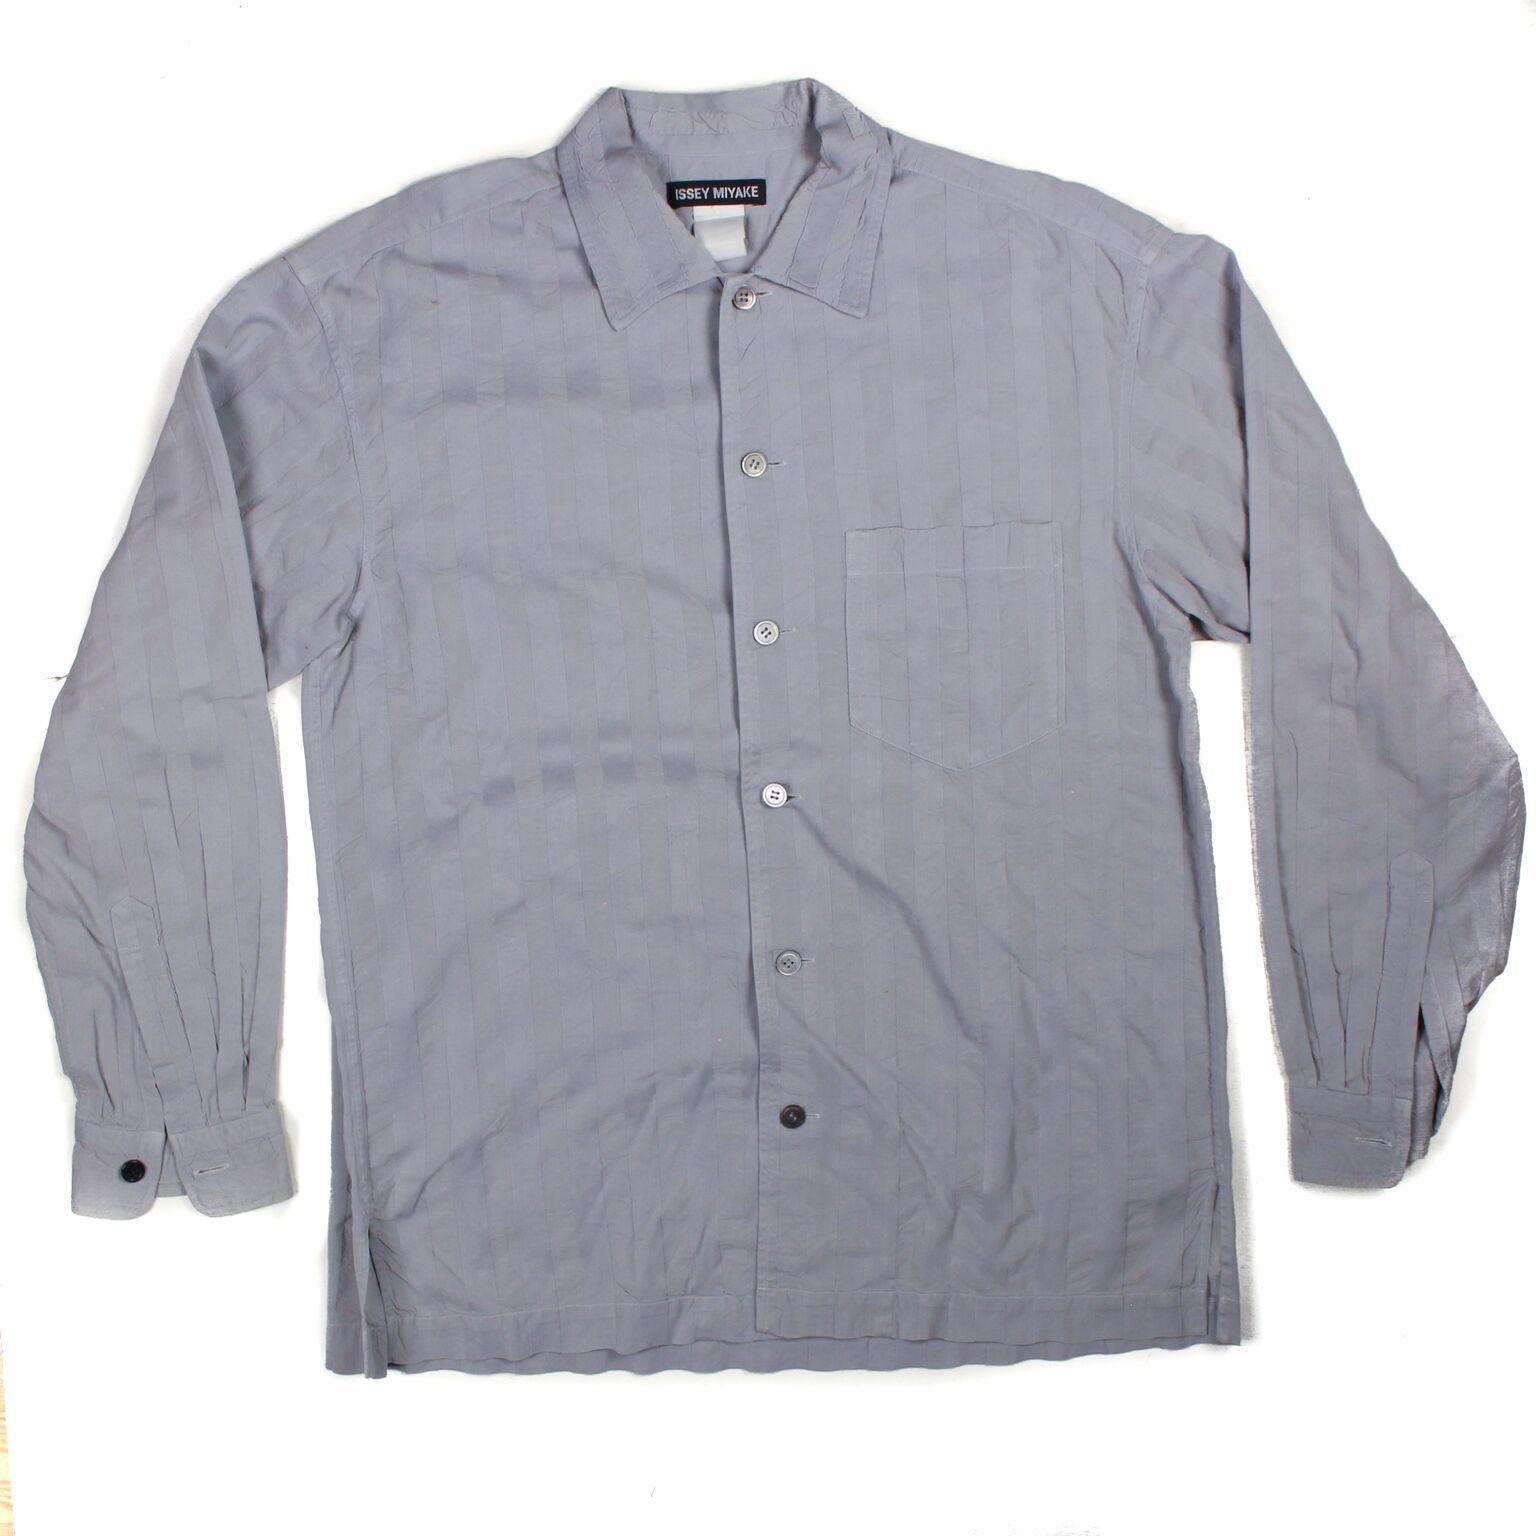 Issey Miyake - Long Sleeve Button Down Shirt - grau Stripe Quilting - 4 - Medium